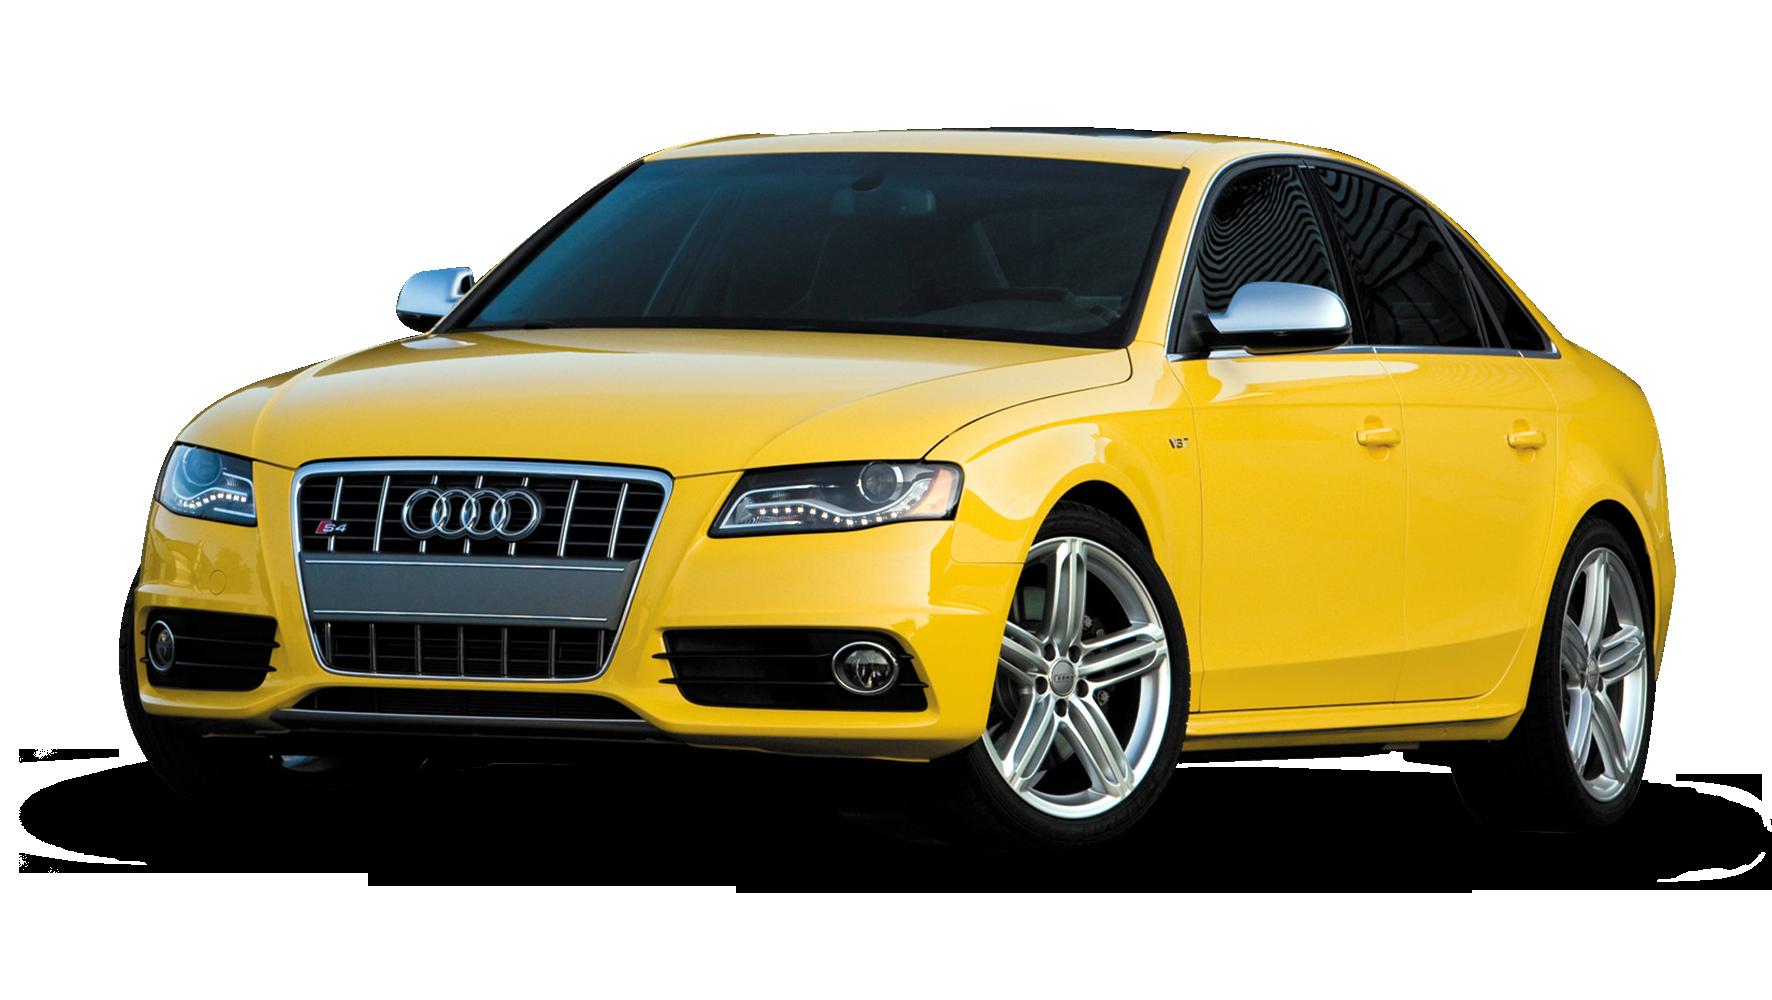 Yellow Audi Car Png Image Purepng Free Transparent Cc0 Png Image